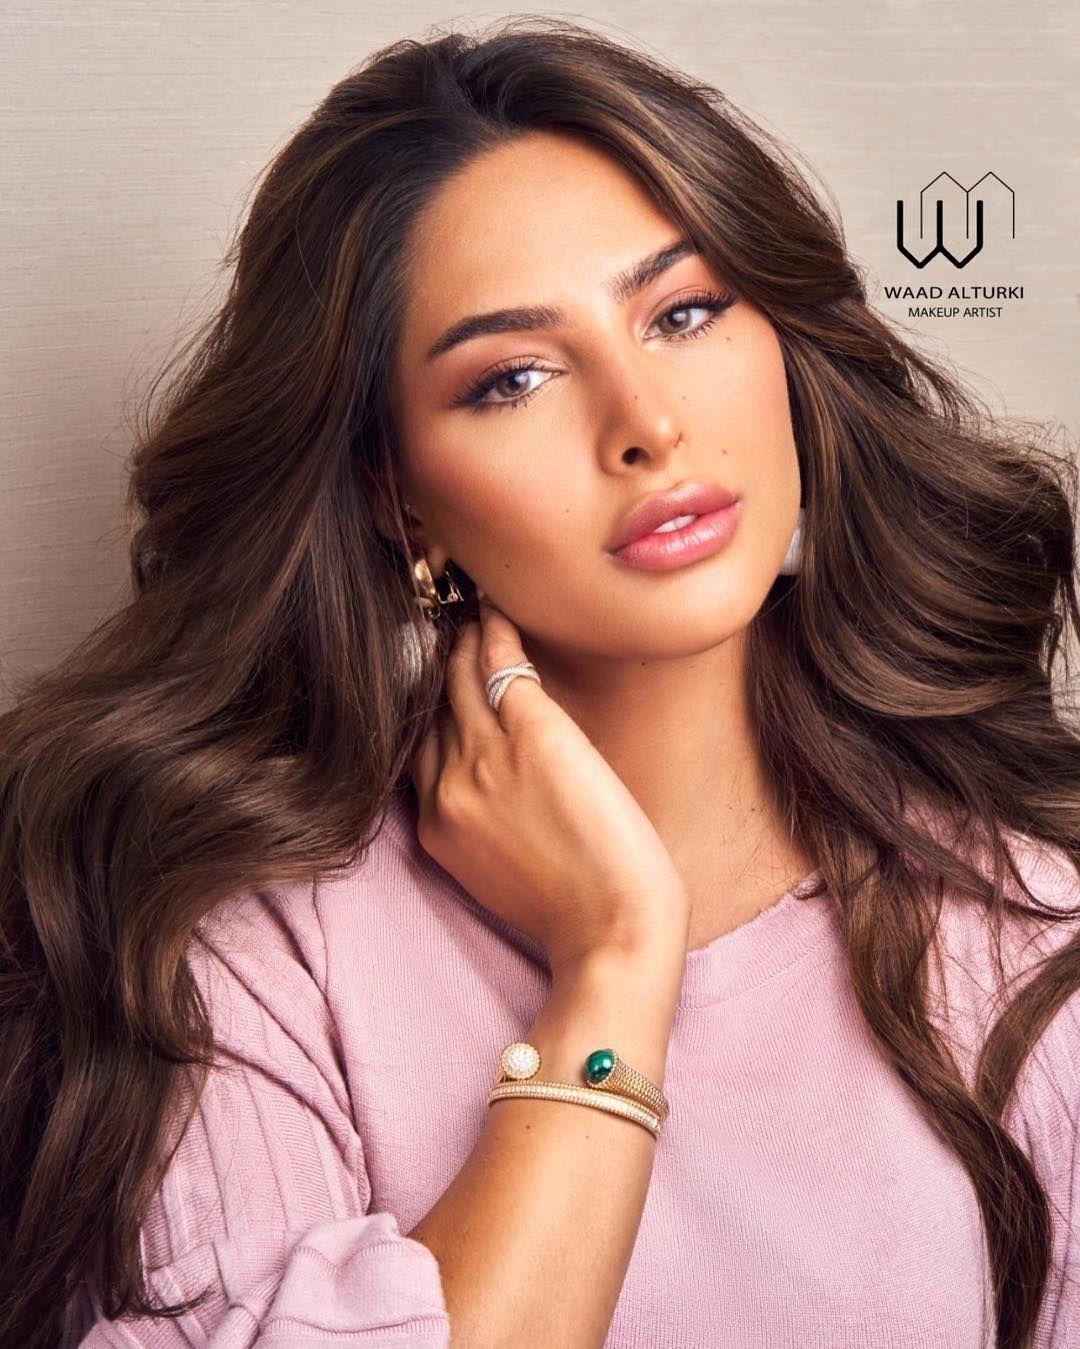 On Fireee Lenses Addict Oro Anesthesia Saudi Agent شوفوا الصور كلها و الفيديو المكياج كل Arabian Beauty Women Beautiful Women Faces Beauty